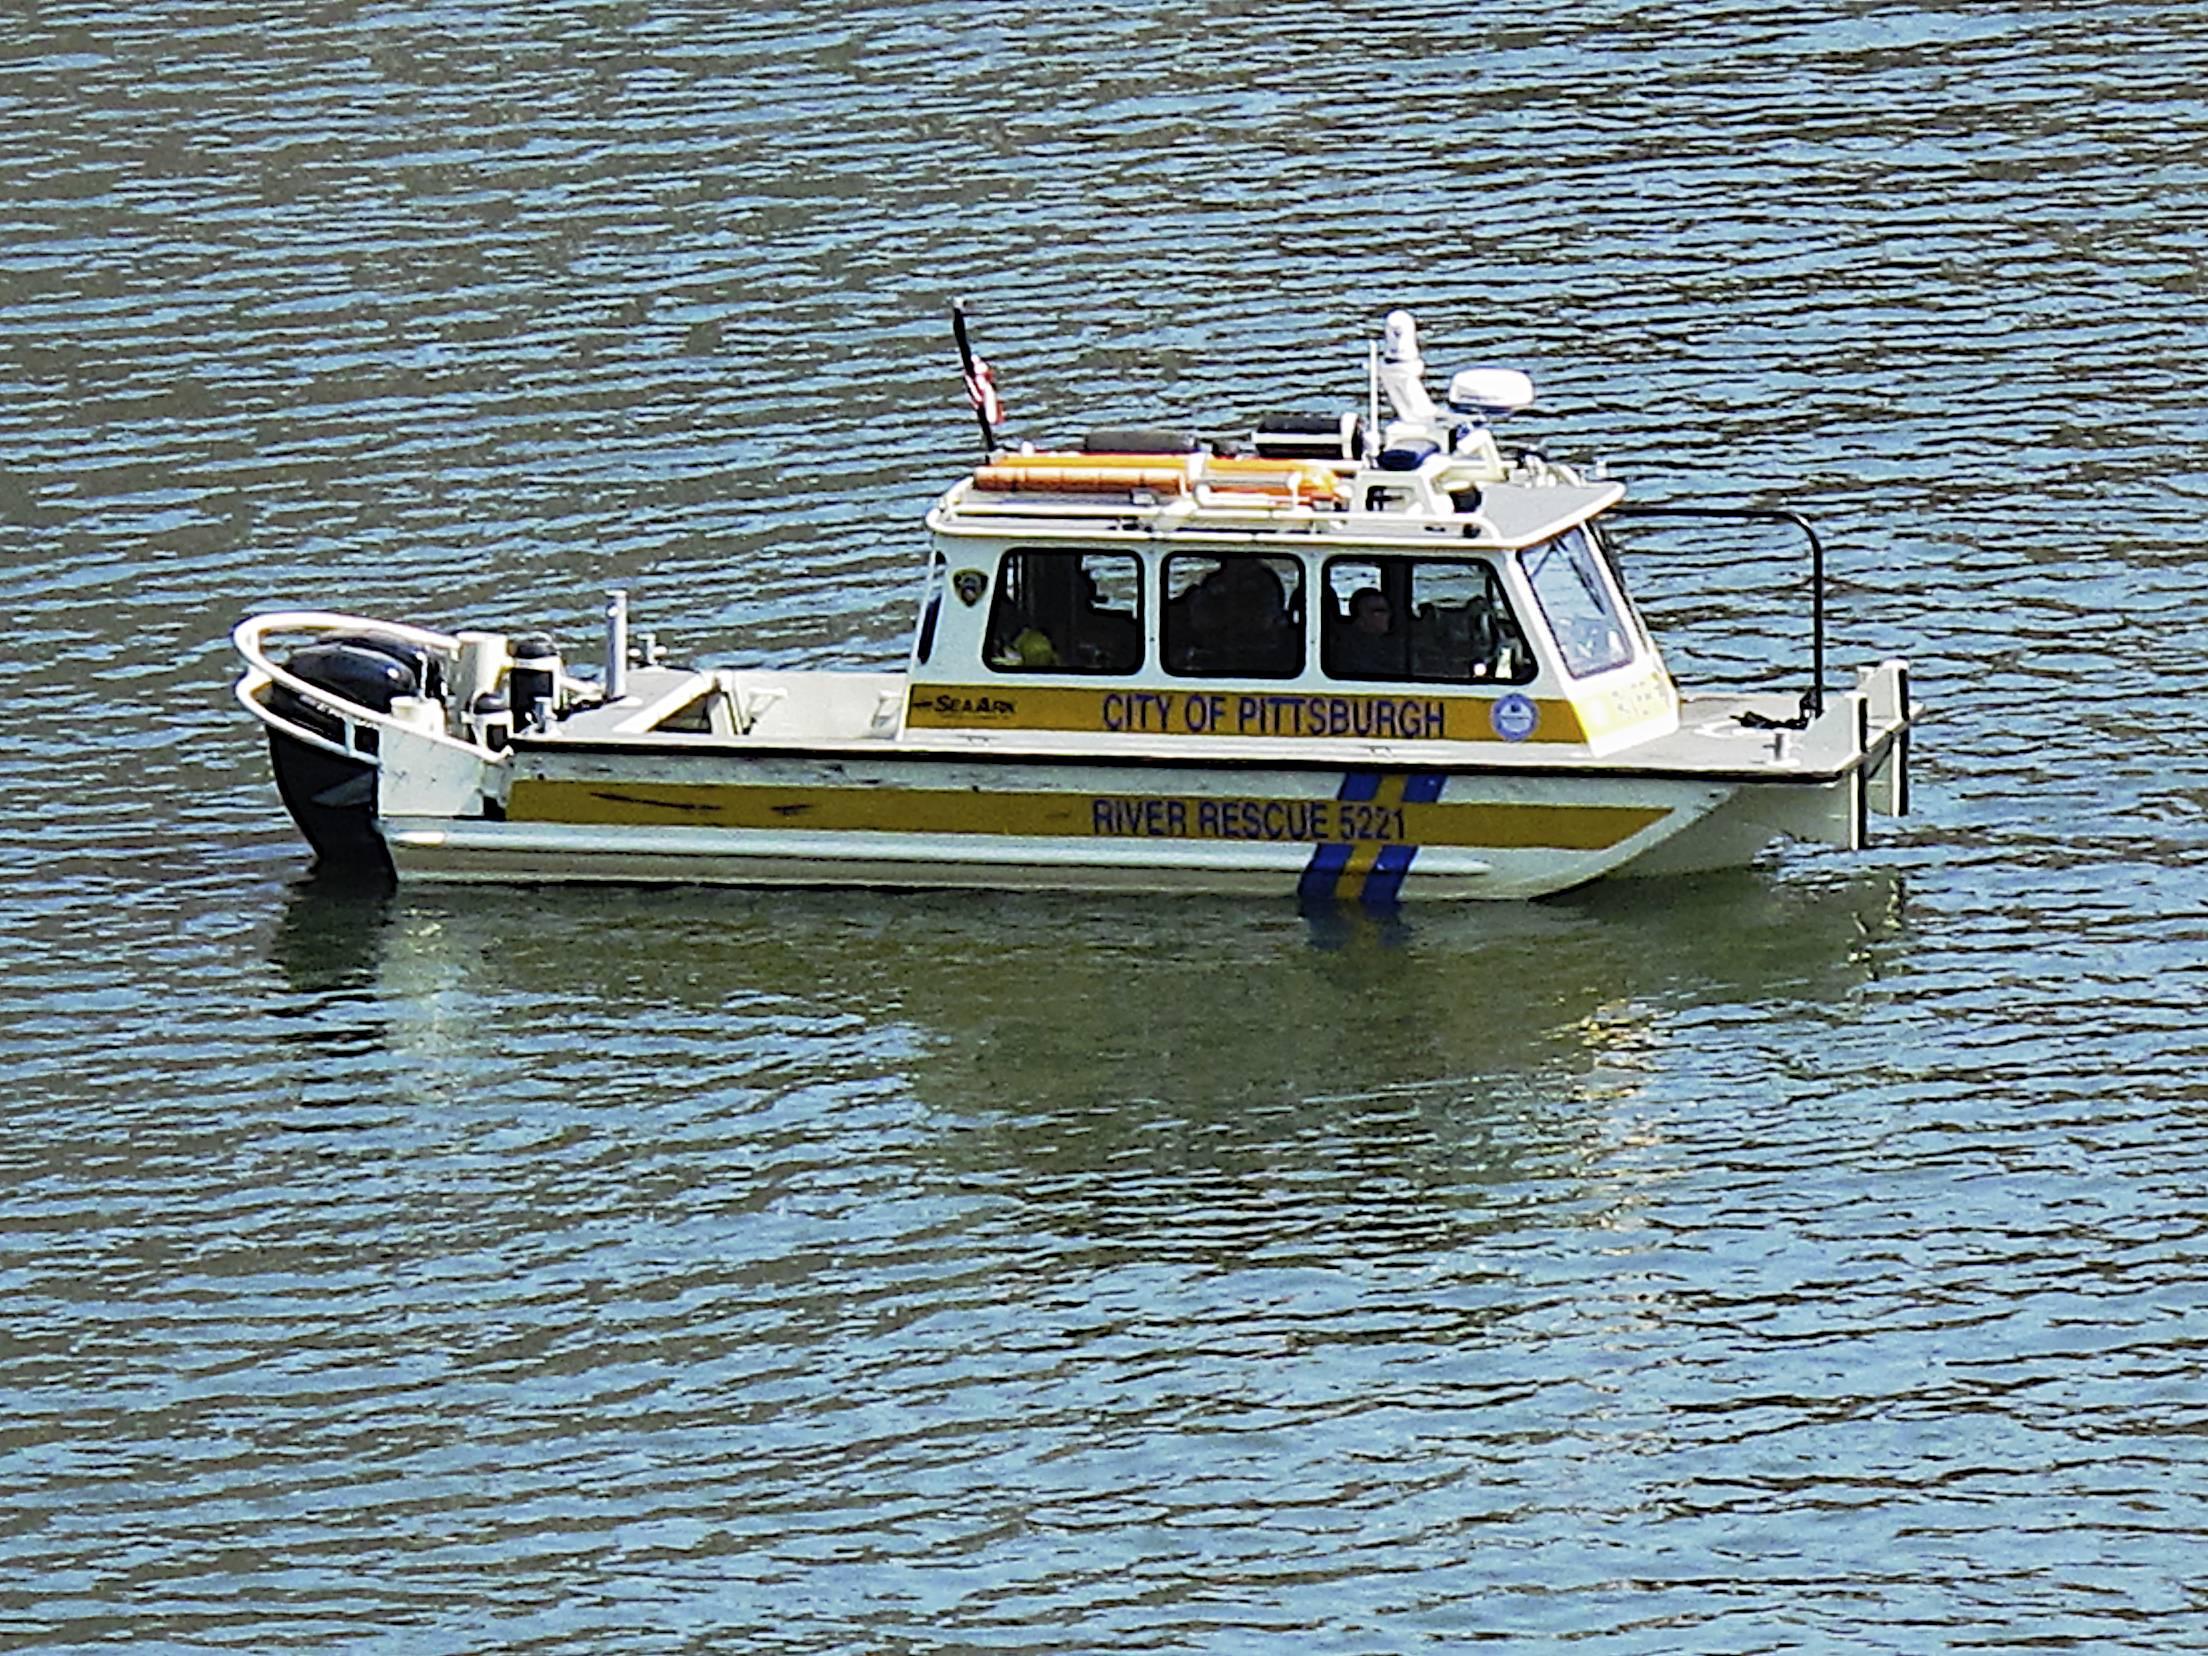 Pgh Boats: River Rescue on the Monongahela